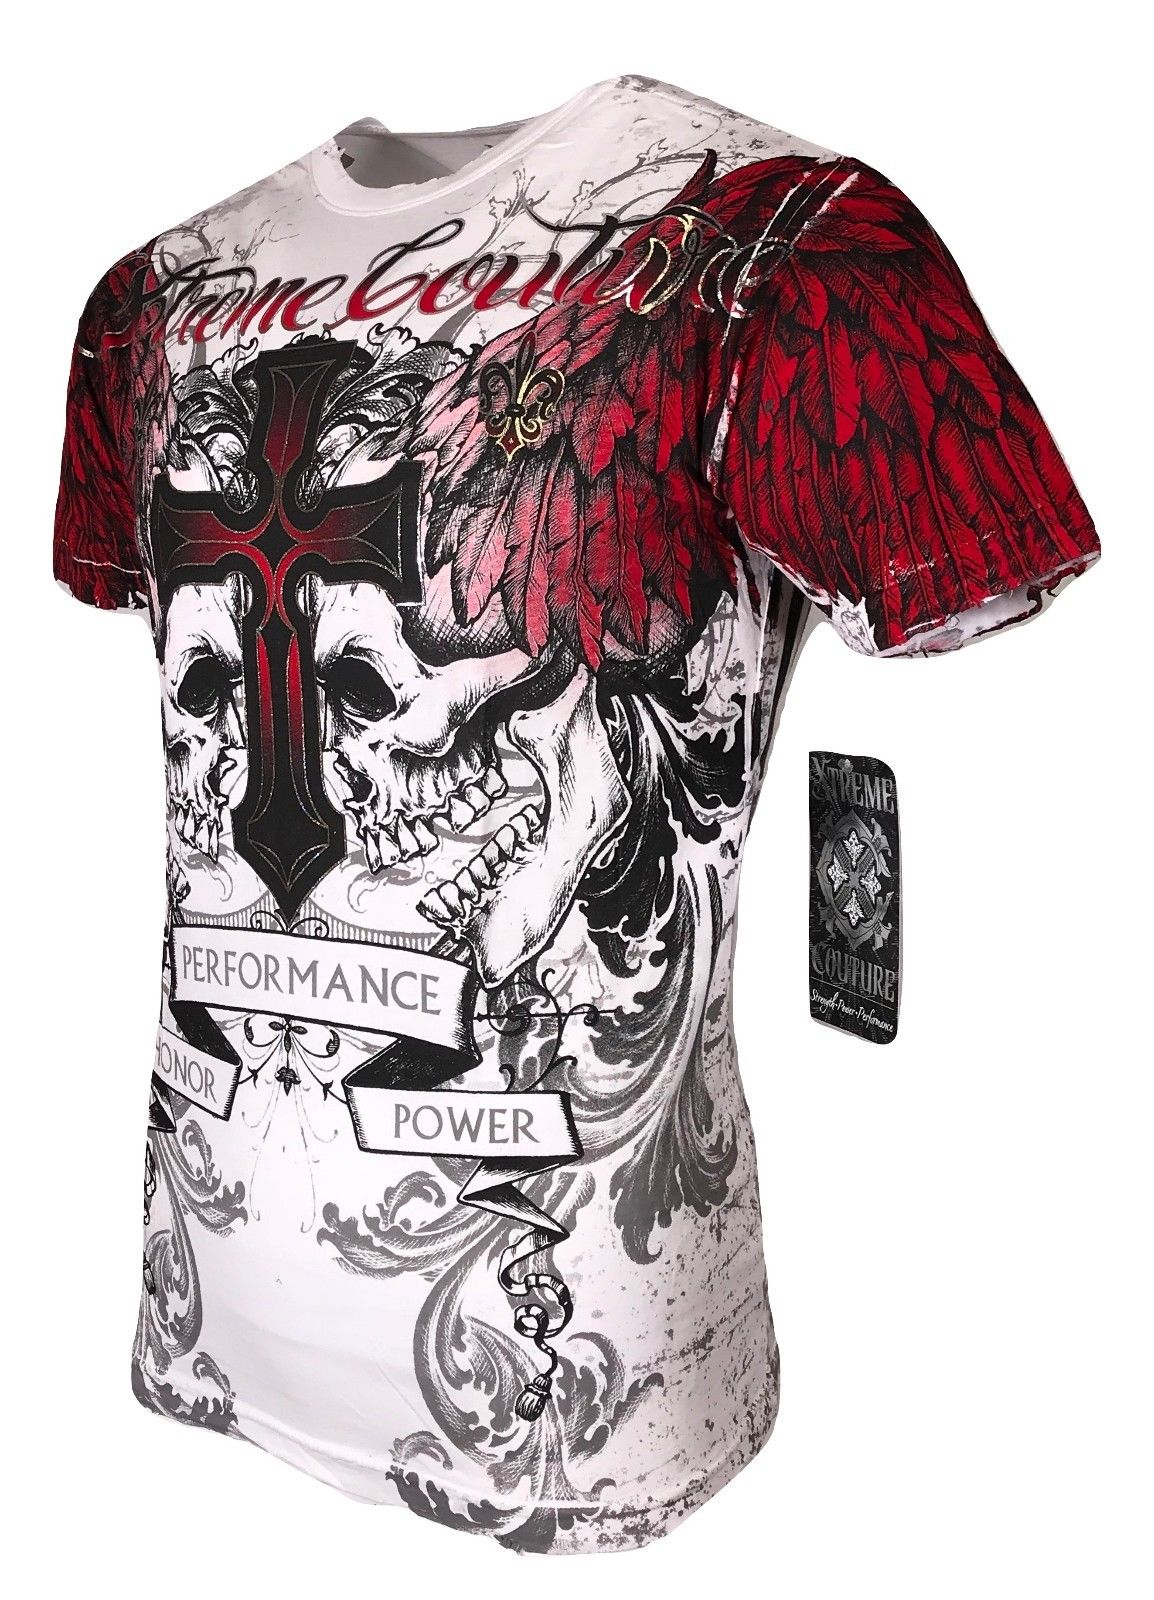 1XTREME COUTURE by AFFLICTION Men T-Shirt RACER GLORY Biker MMA UFC M-4X $40